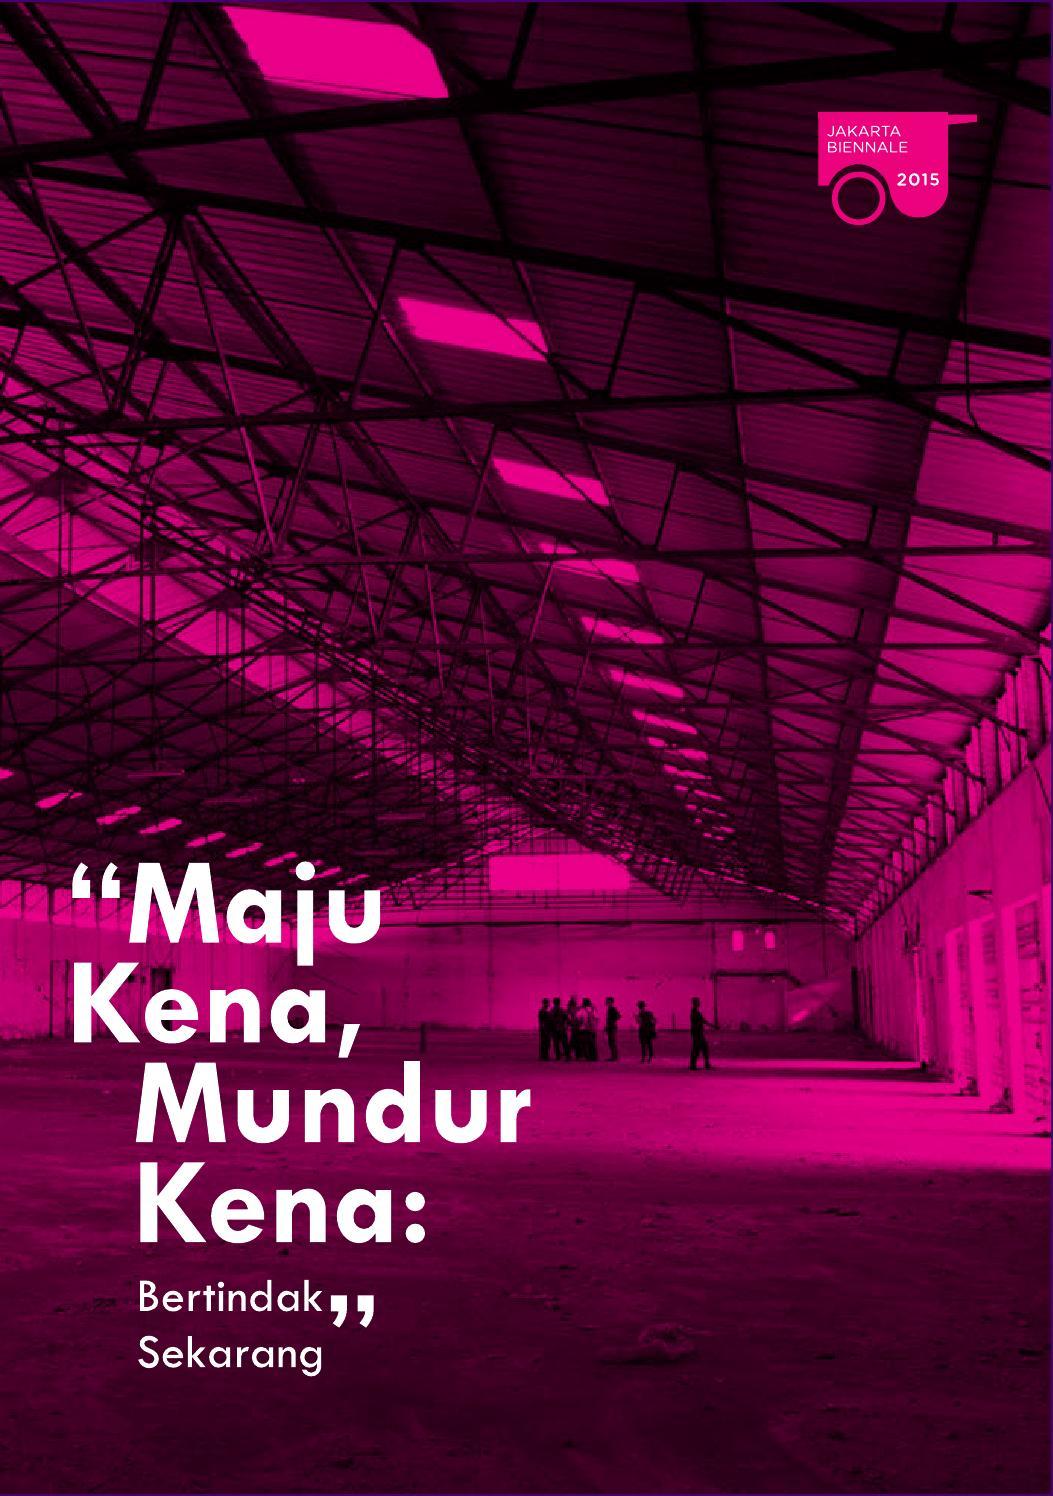 Katalog Jakarta Biennale 2015 Maju Kena Mundur Kena Bertindak